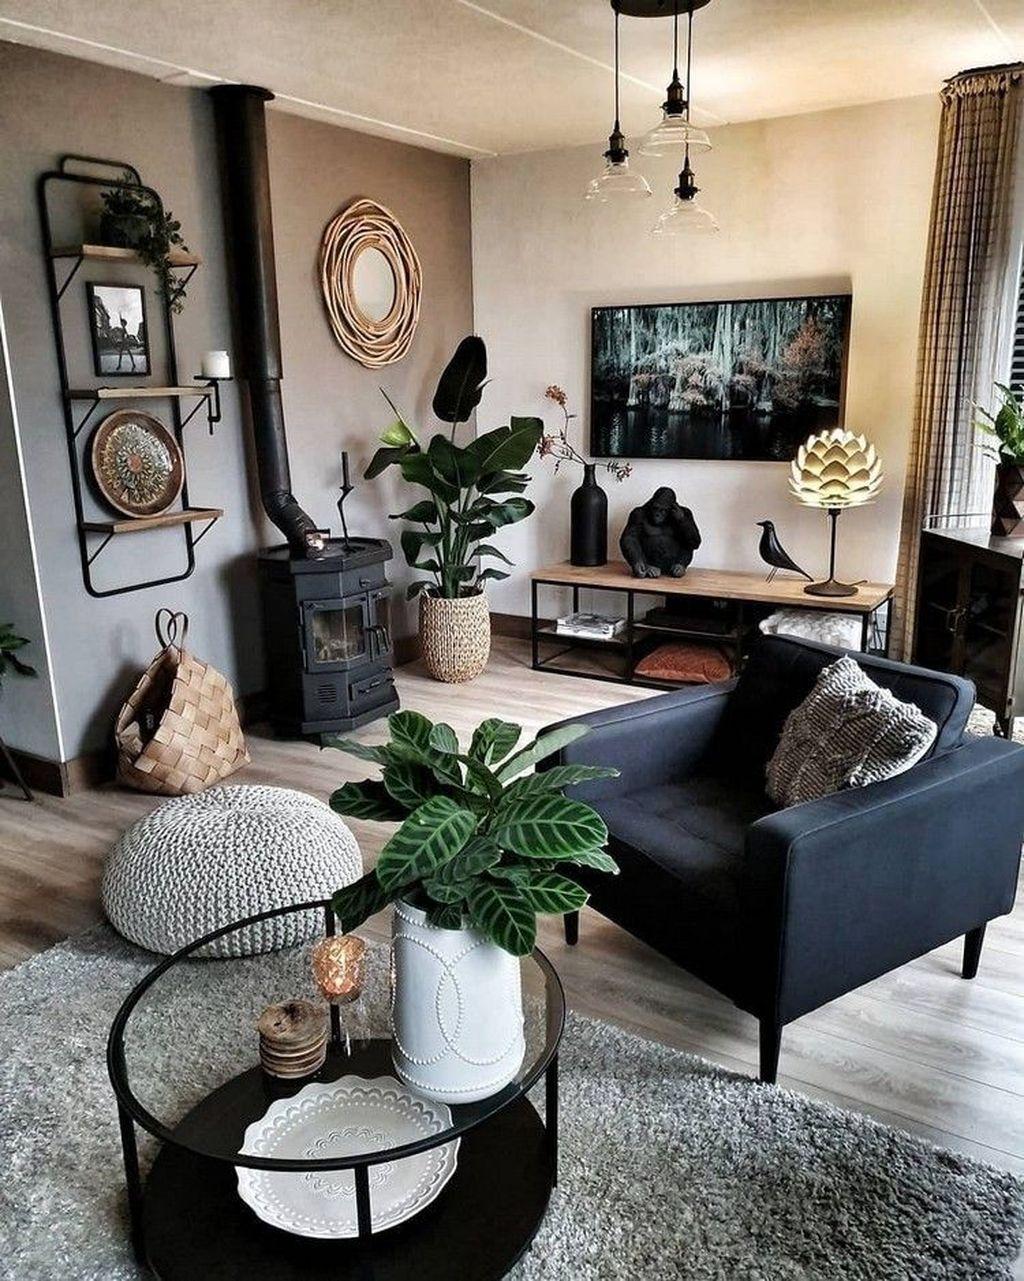 32 Awesome Modern Living Room Decor Ideas Living Room Decor Apartment Room Decor Living Room Designs